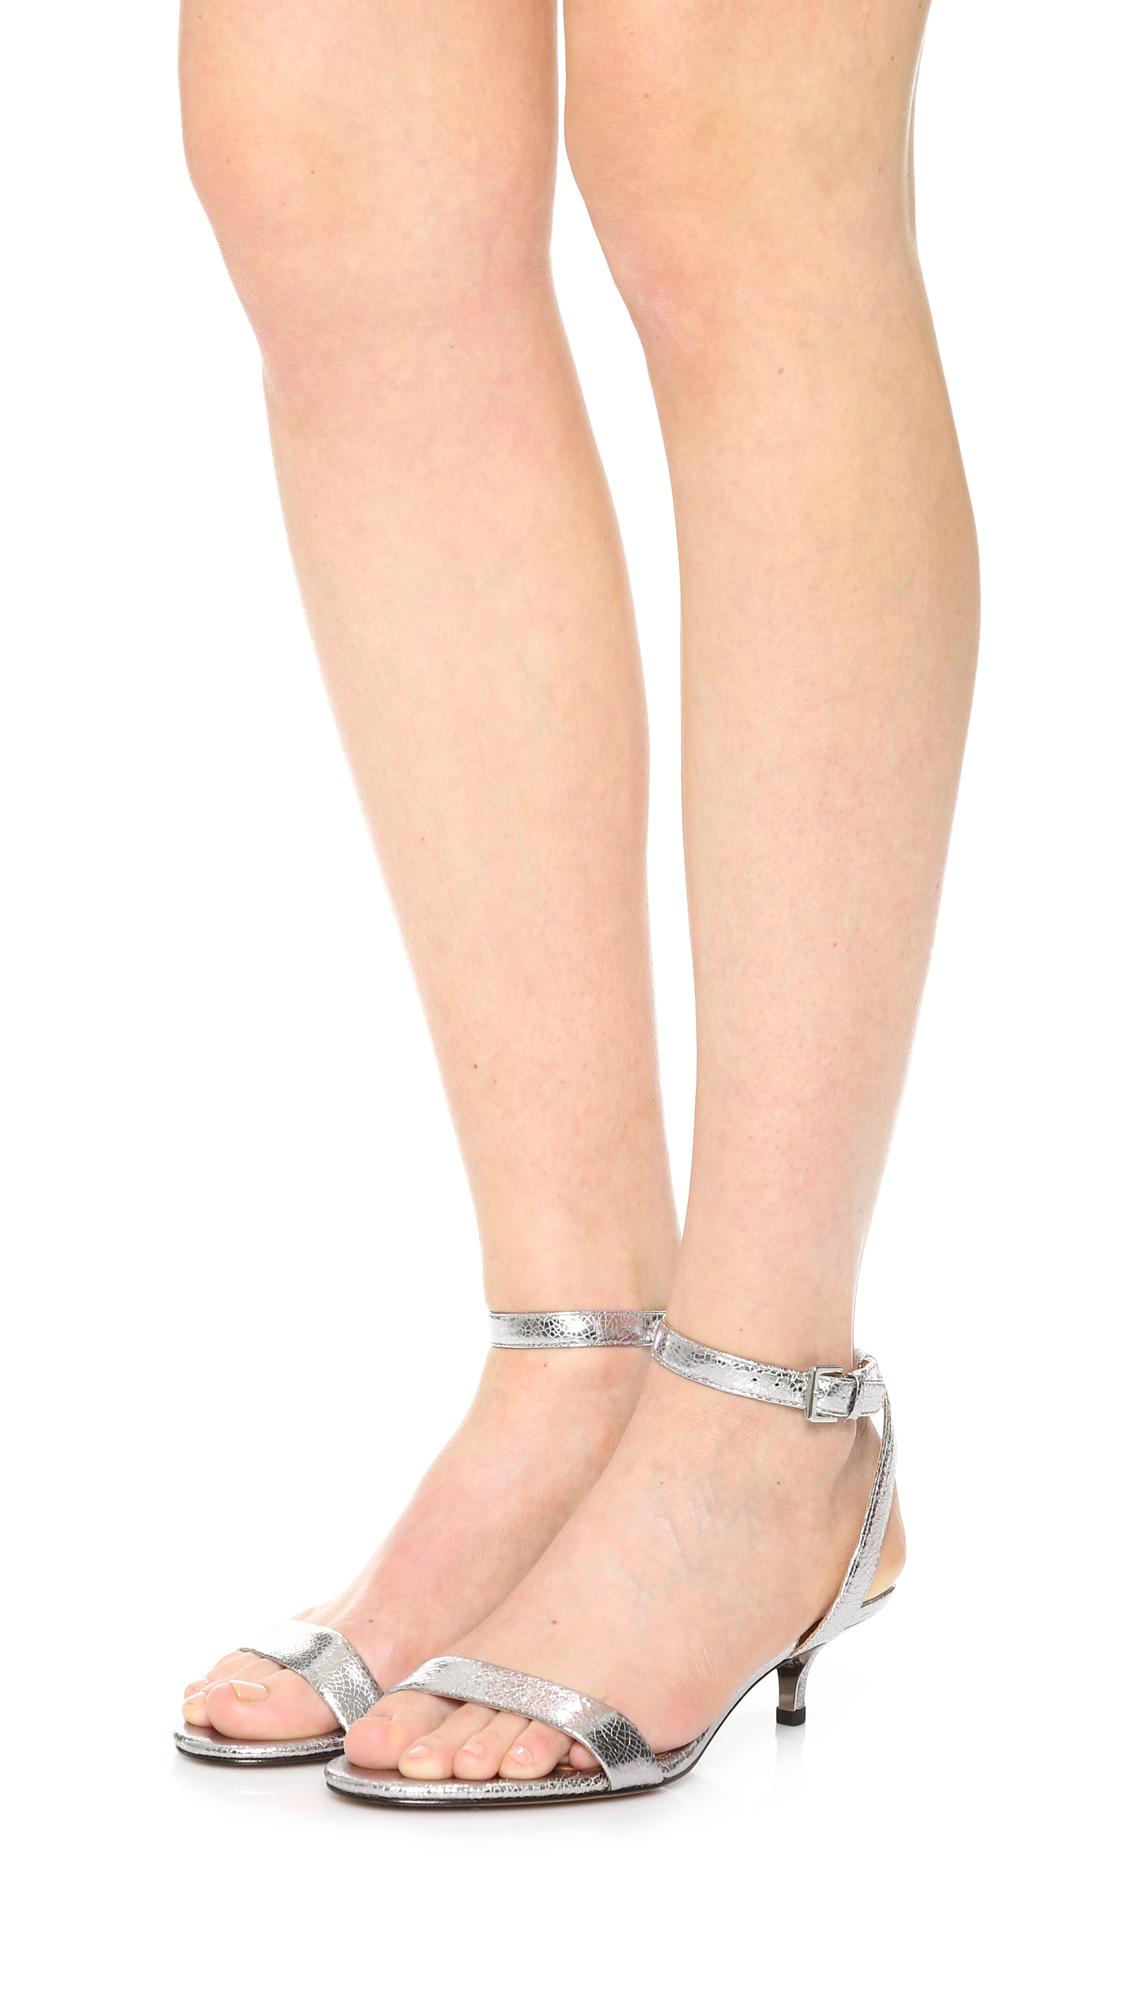 df10c312446 Tory Burch Elana Metallic Sandals